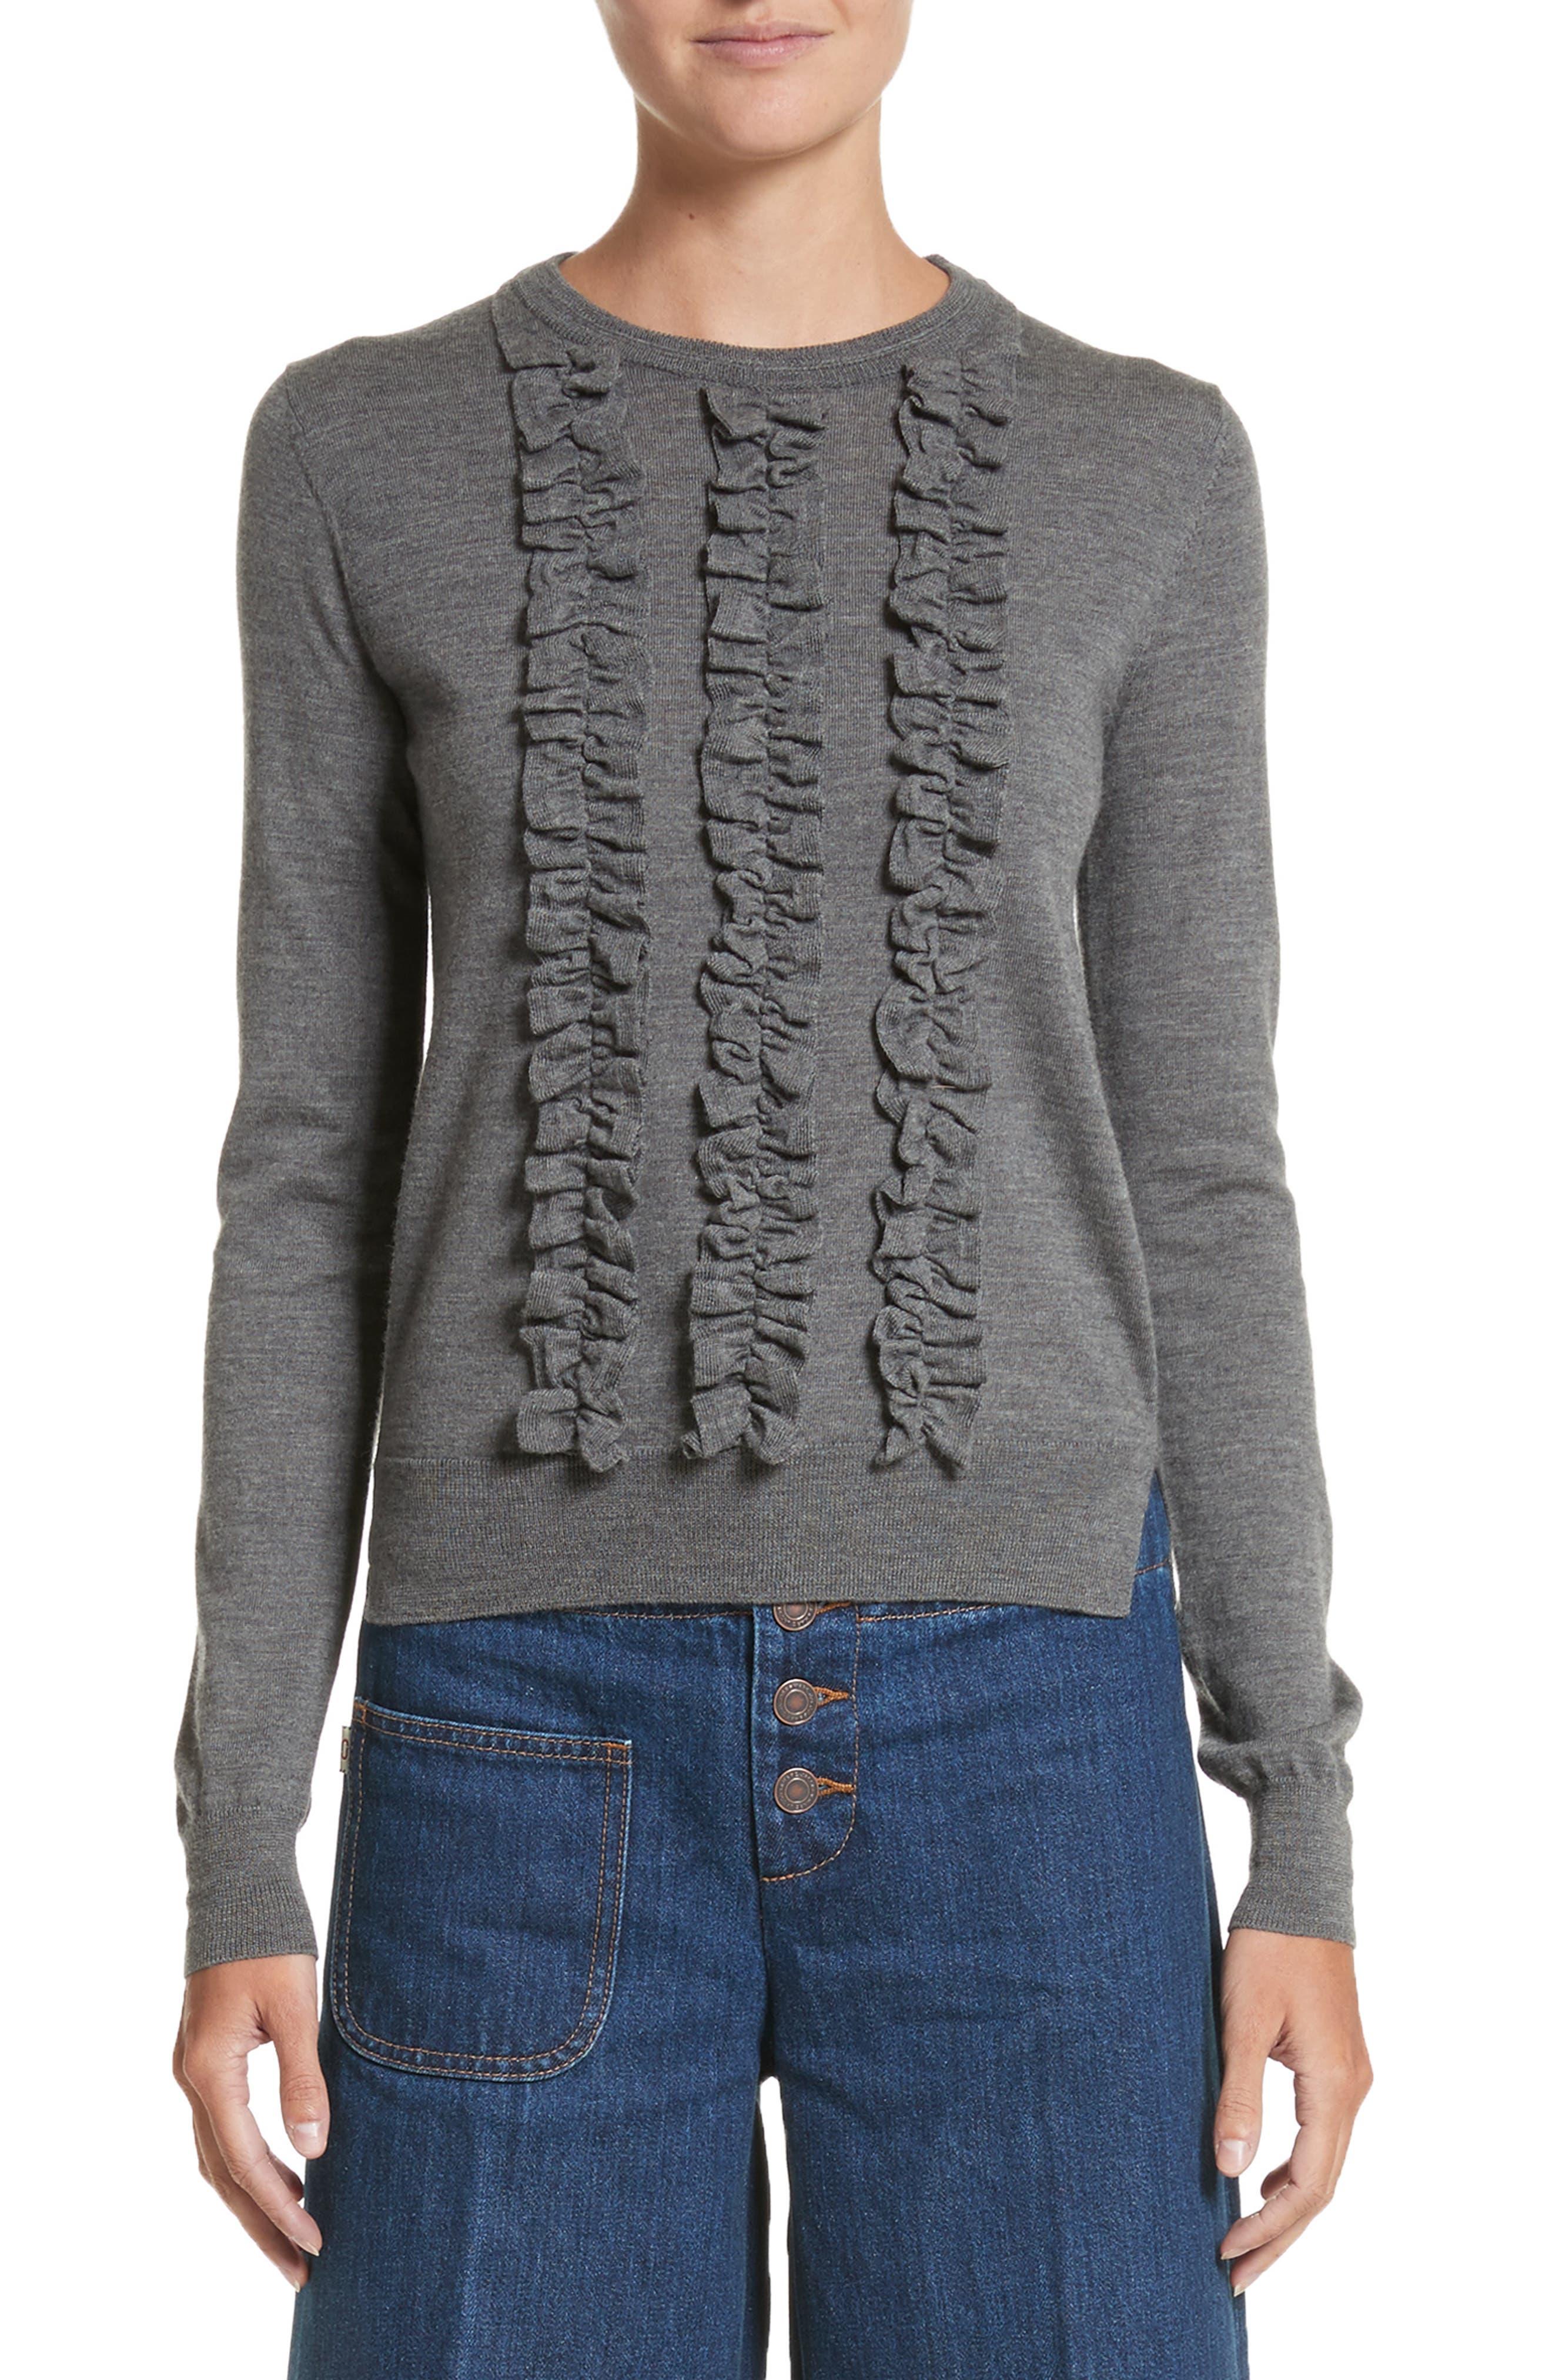 Ruffle Merino Wool Sweater,                             Main thumbnail 1, color,                             Dark Grey Melange